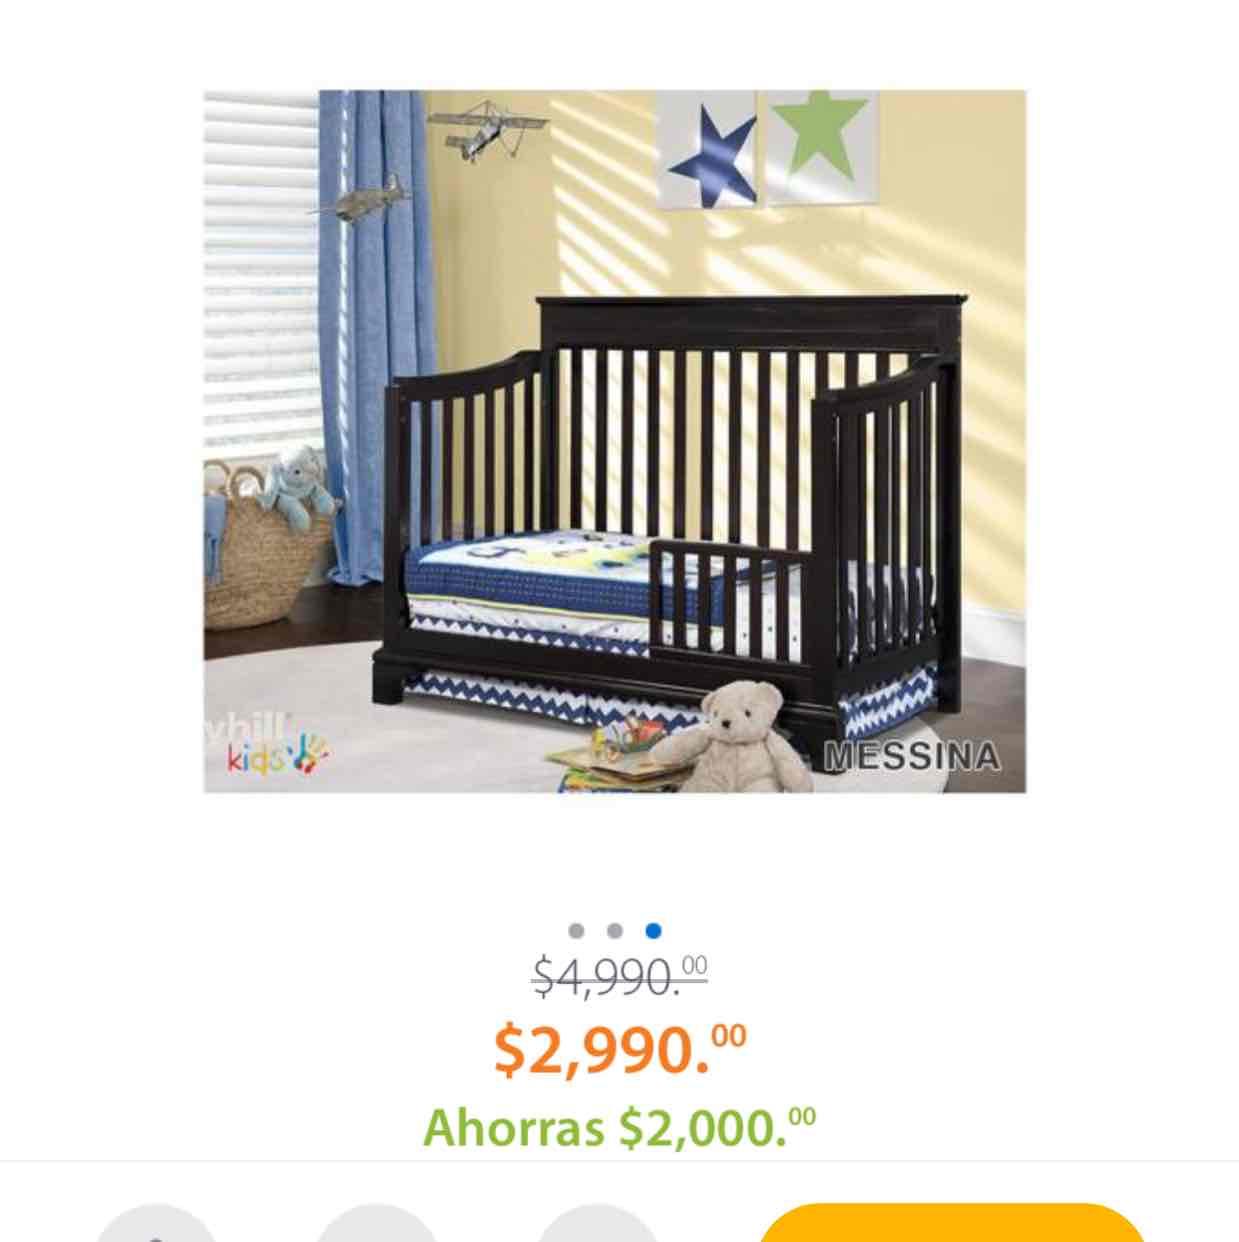 Walmart: Cuna Convertible Storkcraft Broyhill Kids Mesina Espresso $2,990